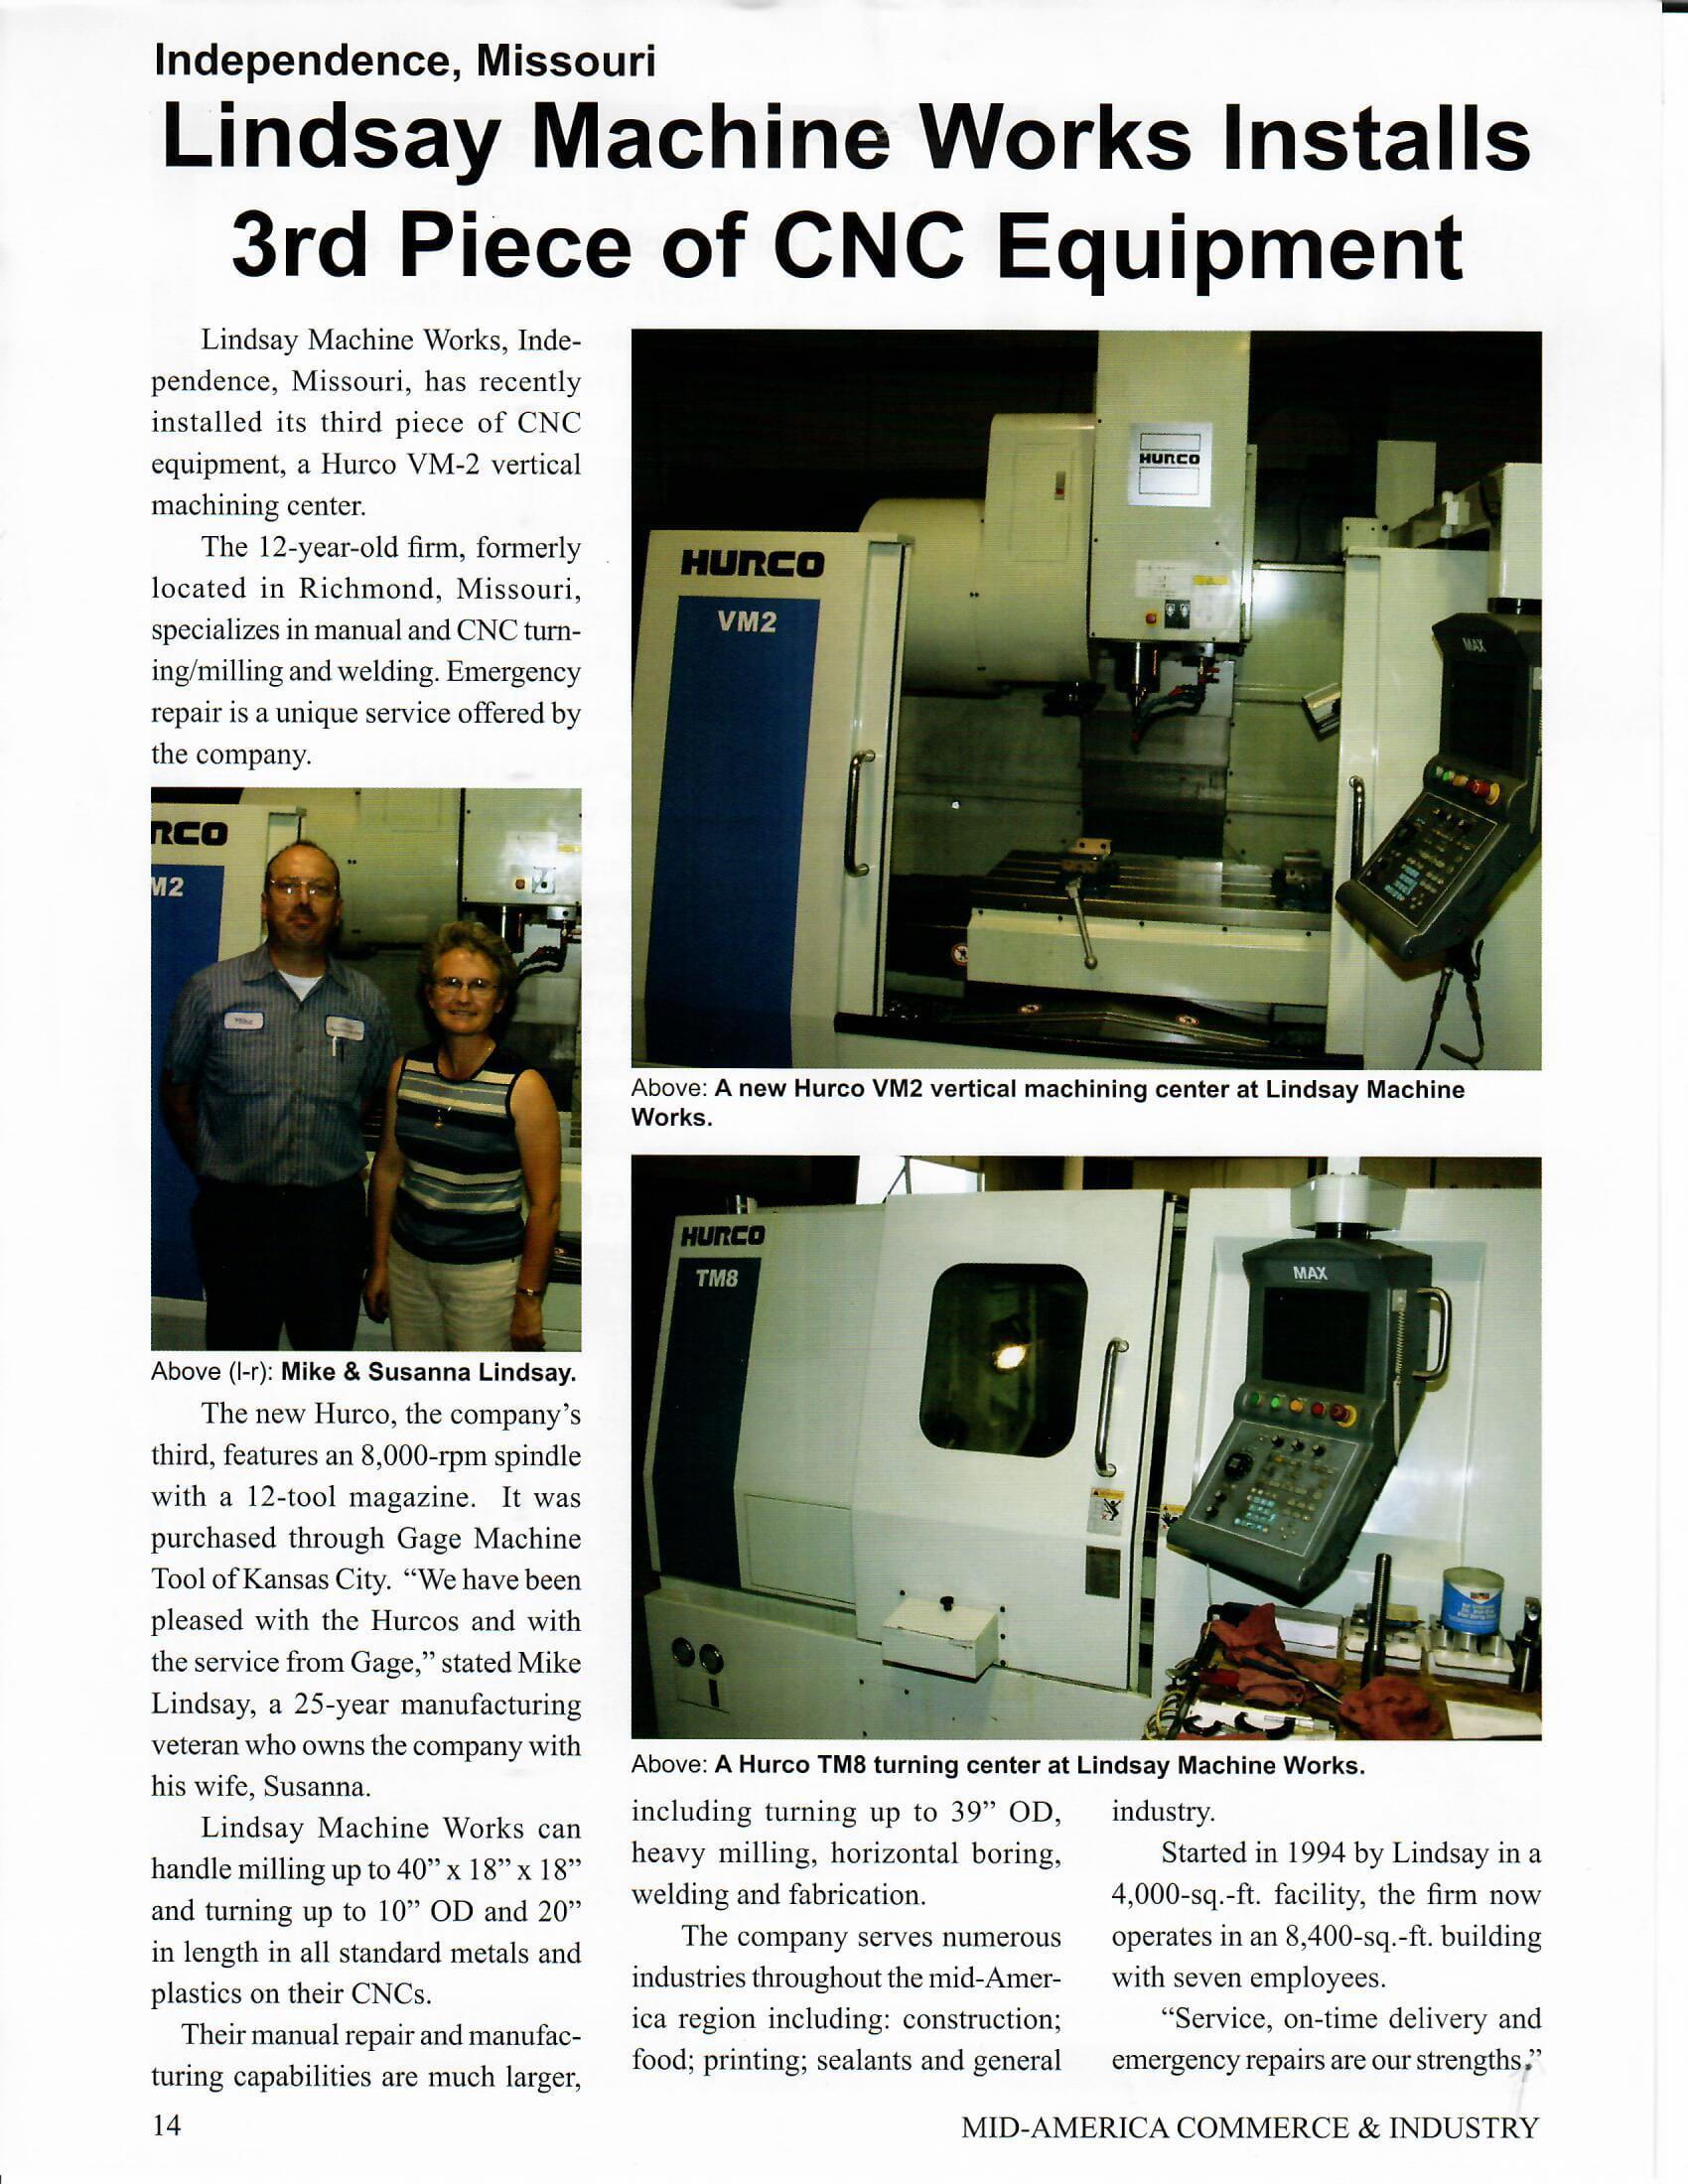 Lindsay Machine Works Press - Videos